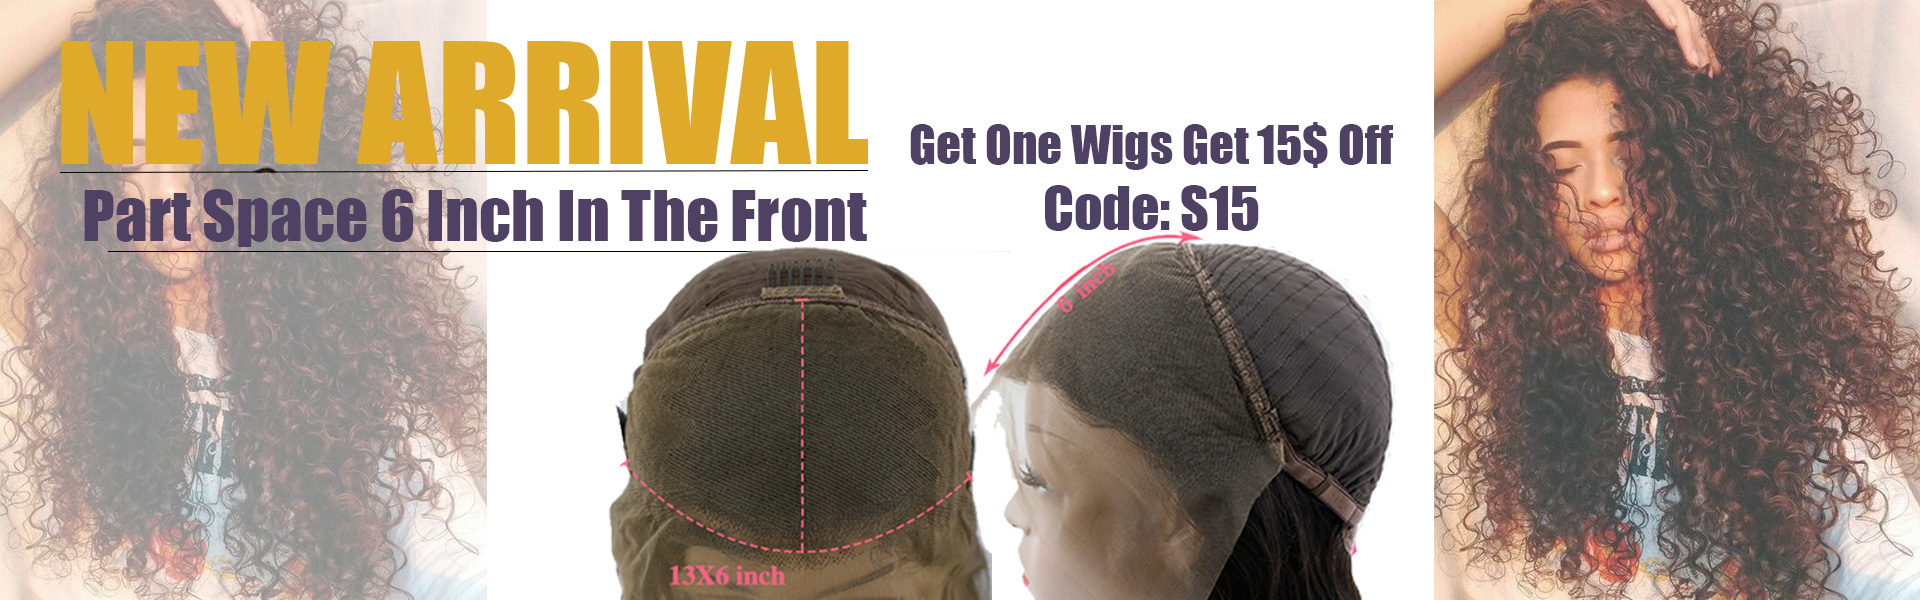 https://www.lwigs.com/lace-wigs/category/human-hair-lace-front-wigs.html